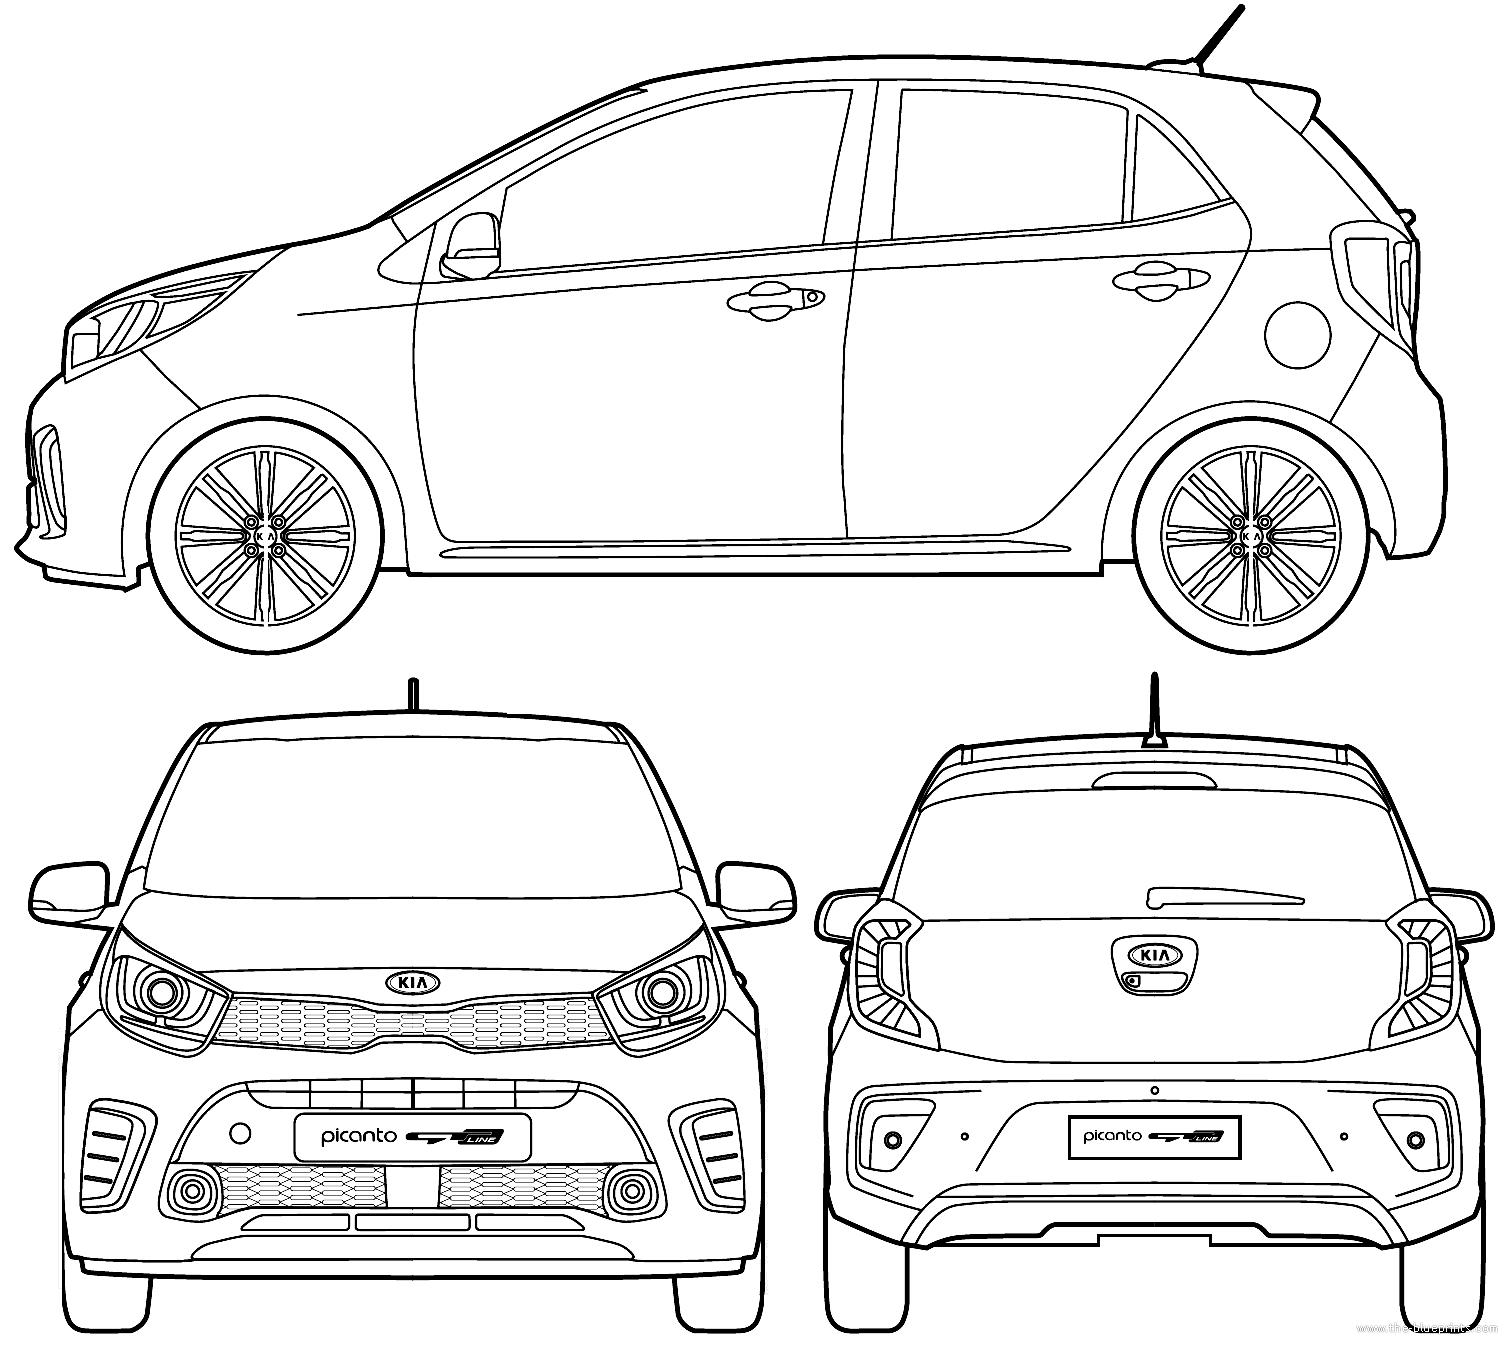 blueprints  u0026gt  cars  u0026gt  kia  u0026gt  kia picanto gt  2017